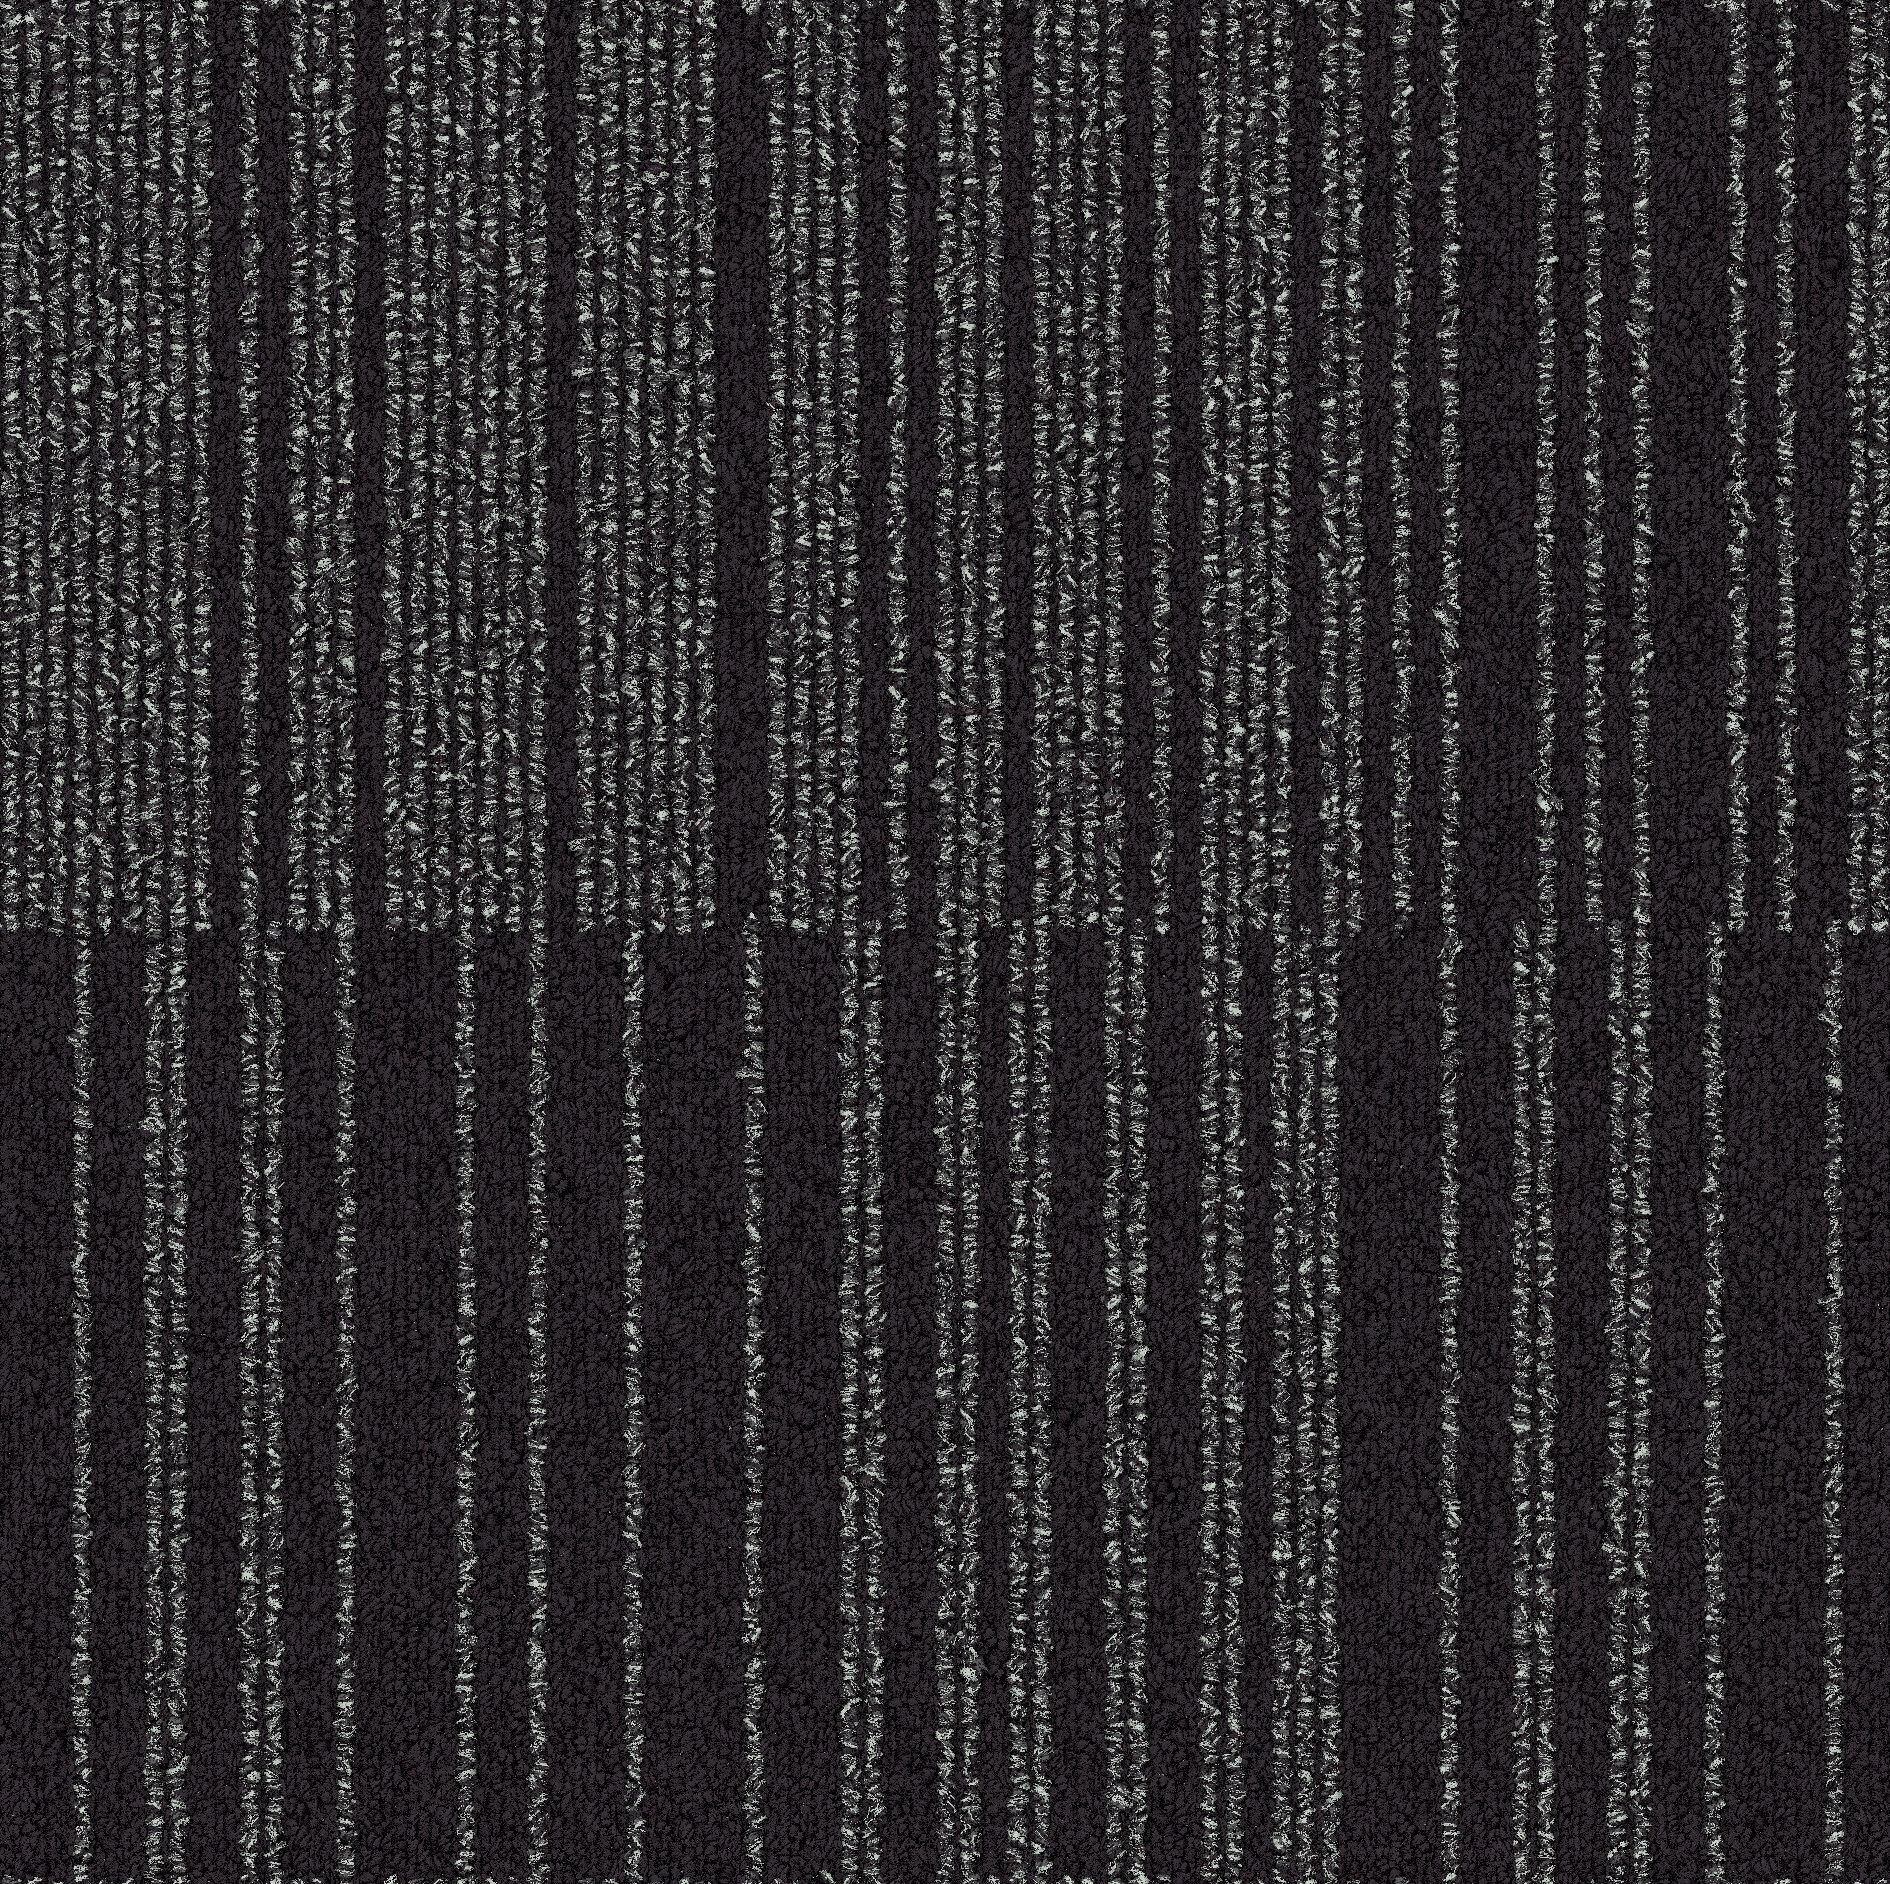 ... Inspiration Carpet Tiles Texture